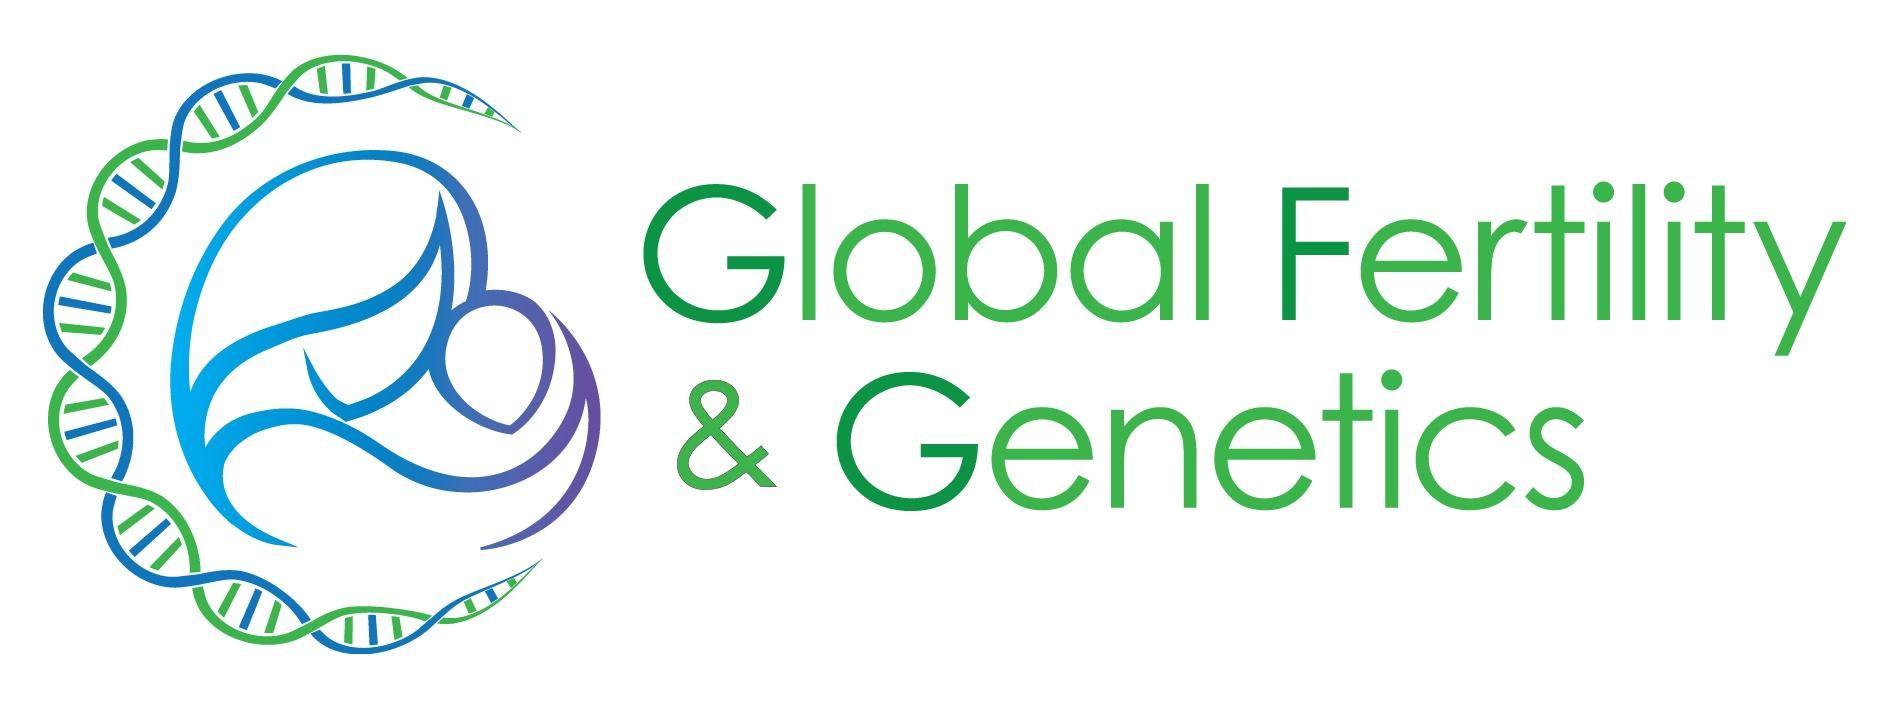 Global Fertility & Genetics, Ny